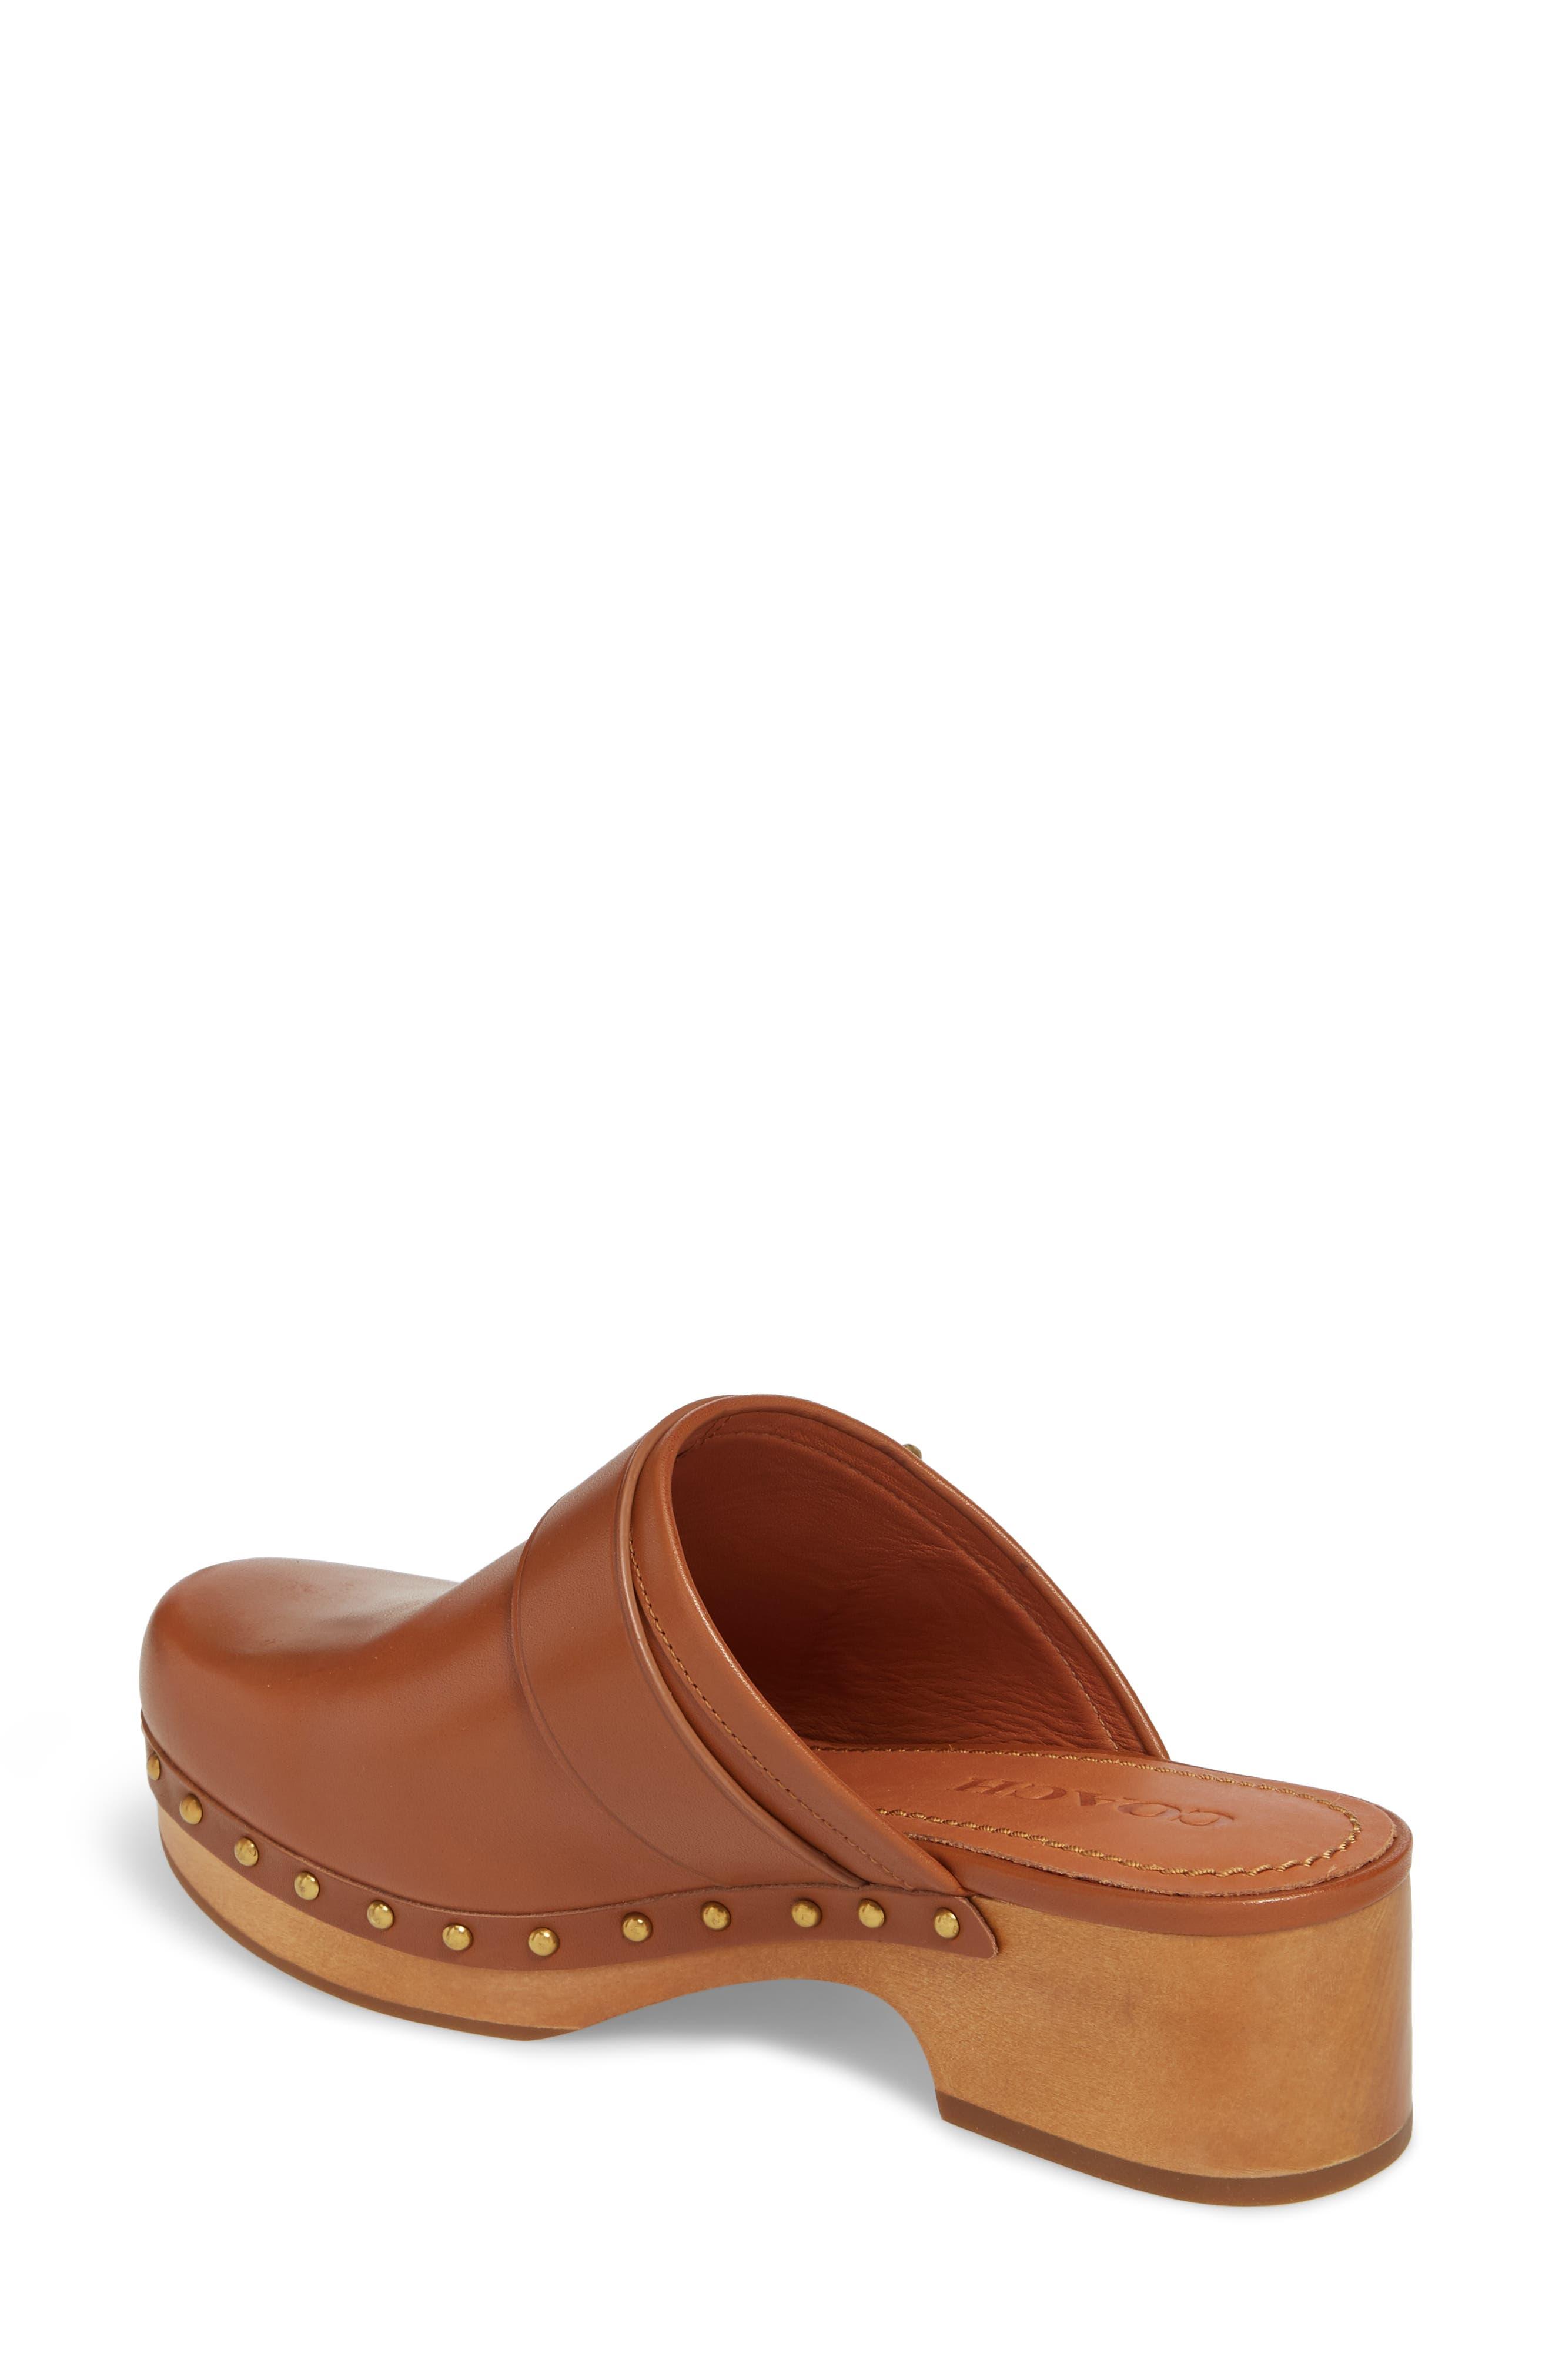 Turnlock Clog,                             Alternate thumbnail 2, color,                             Saddle Leather